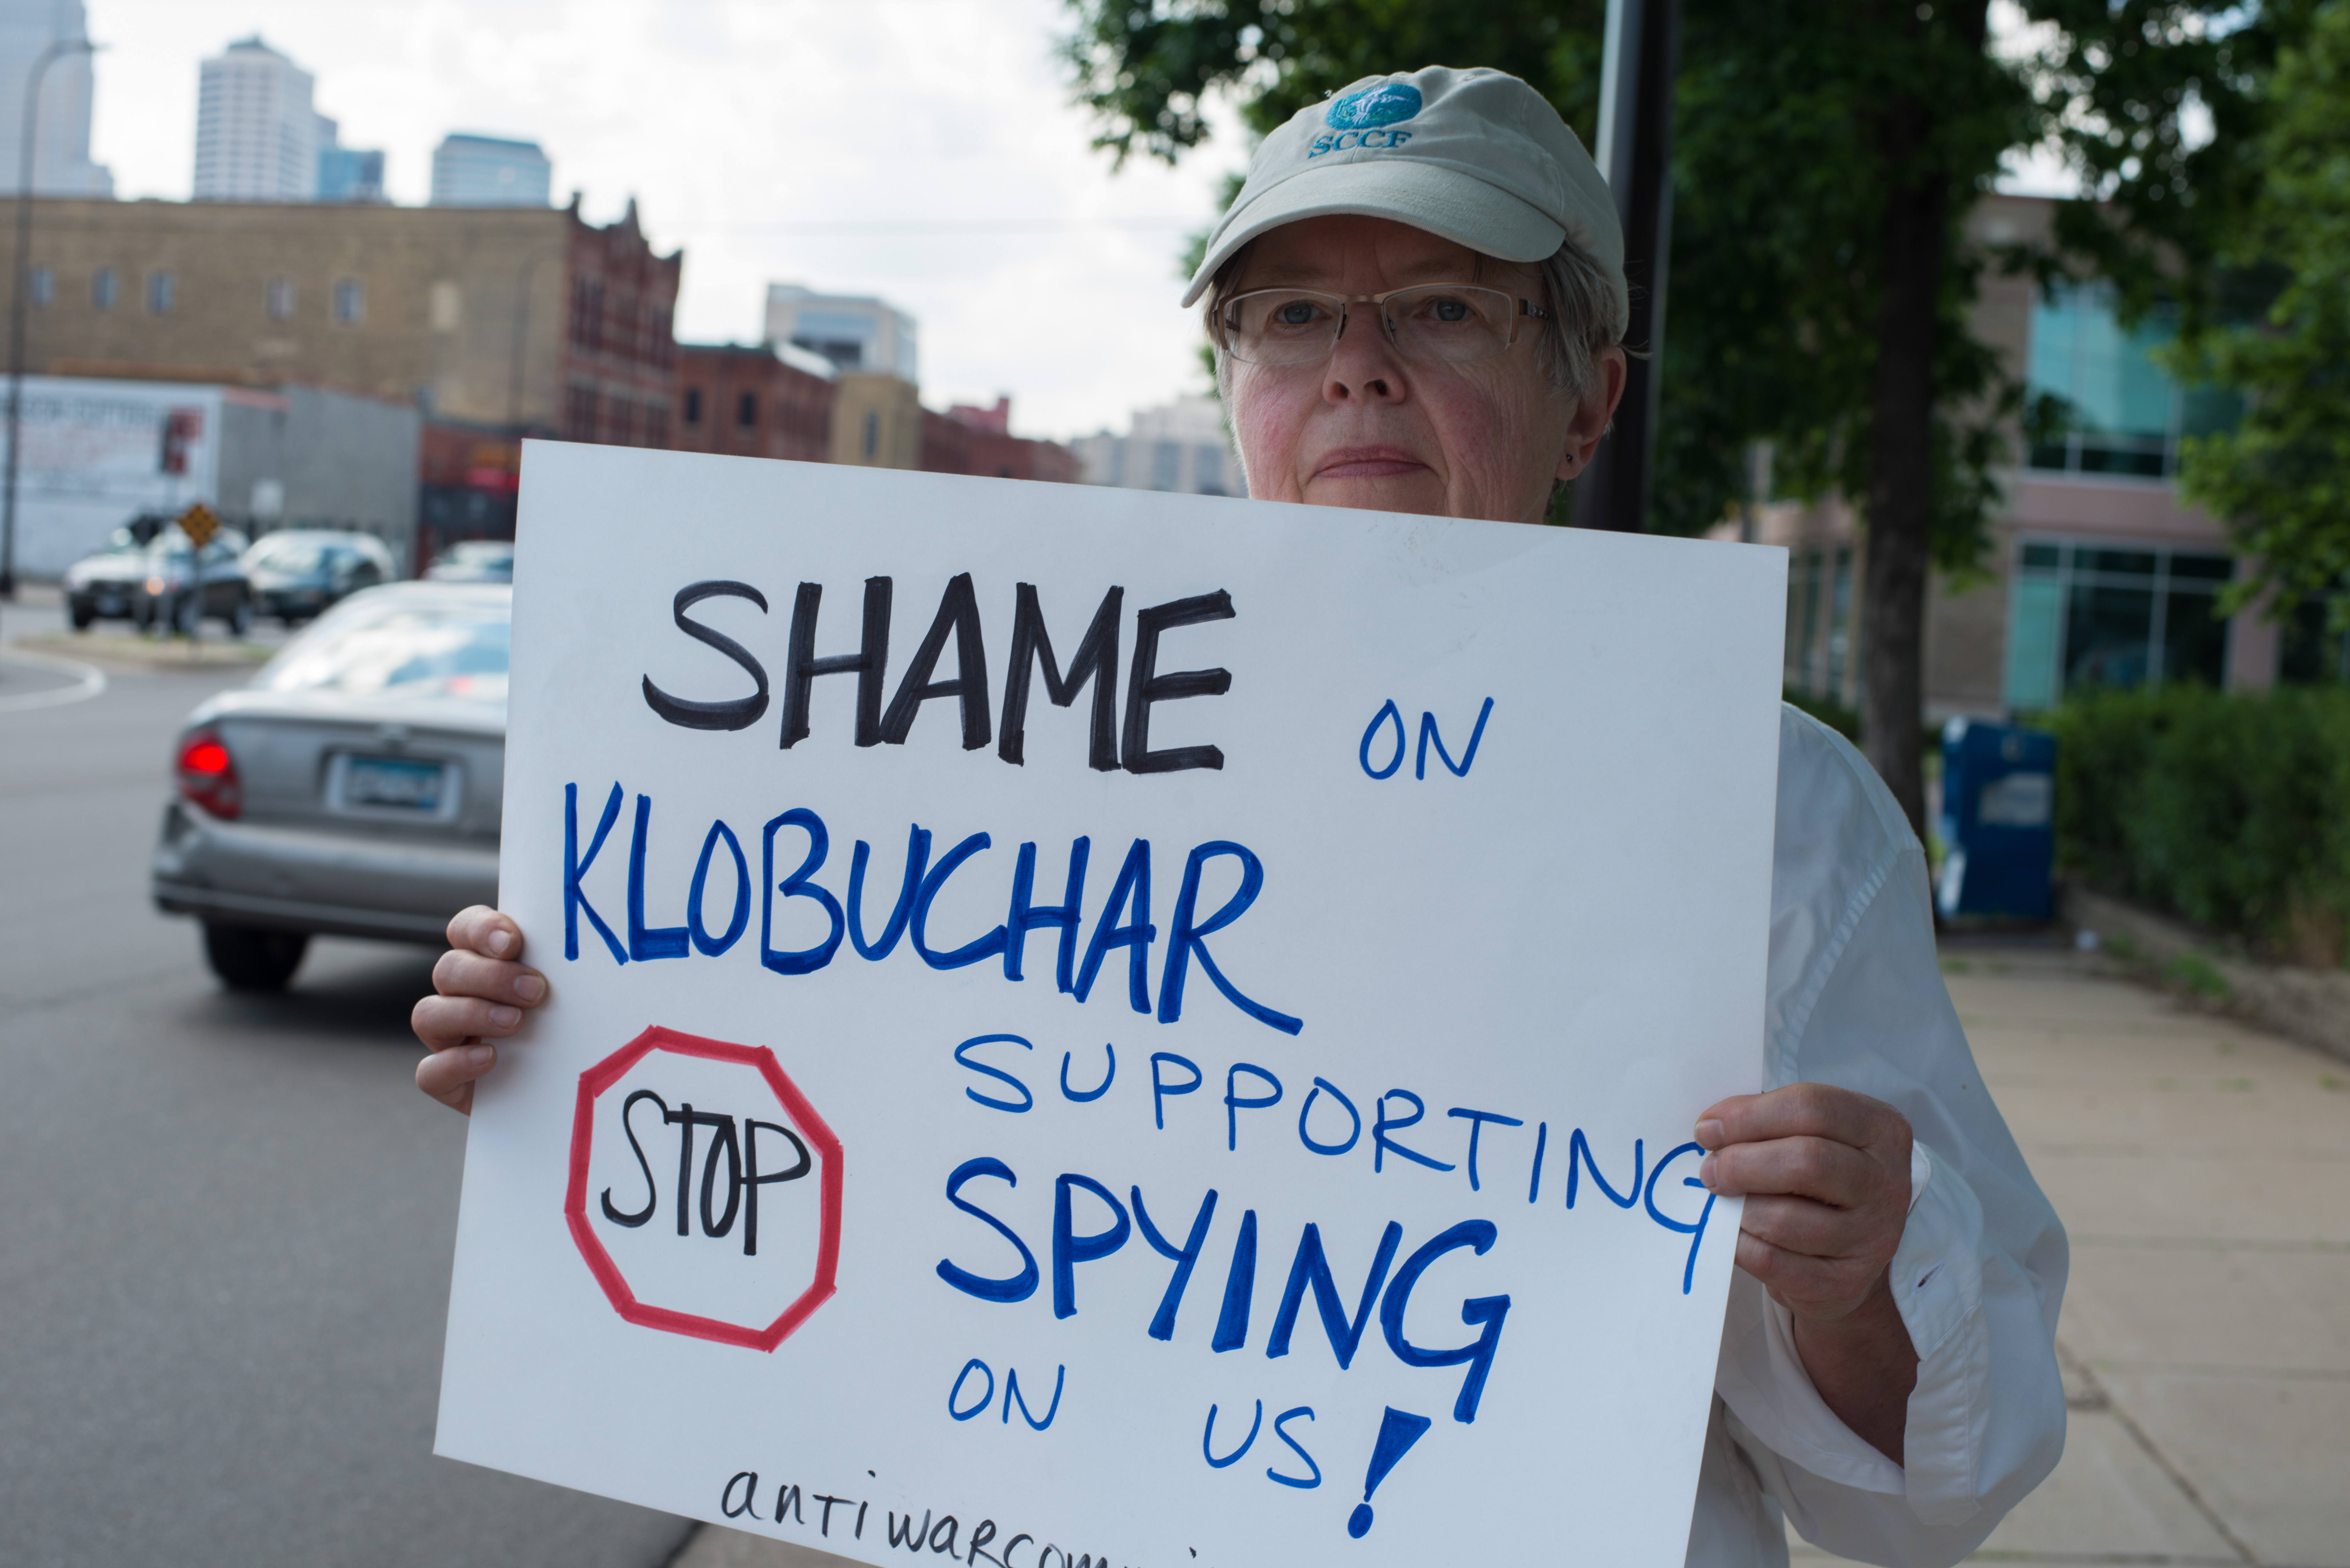 Protest against NSA surveillance